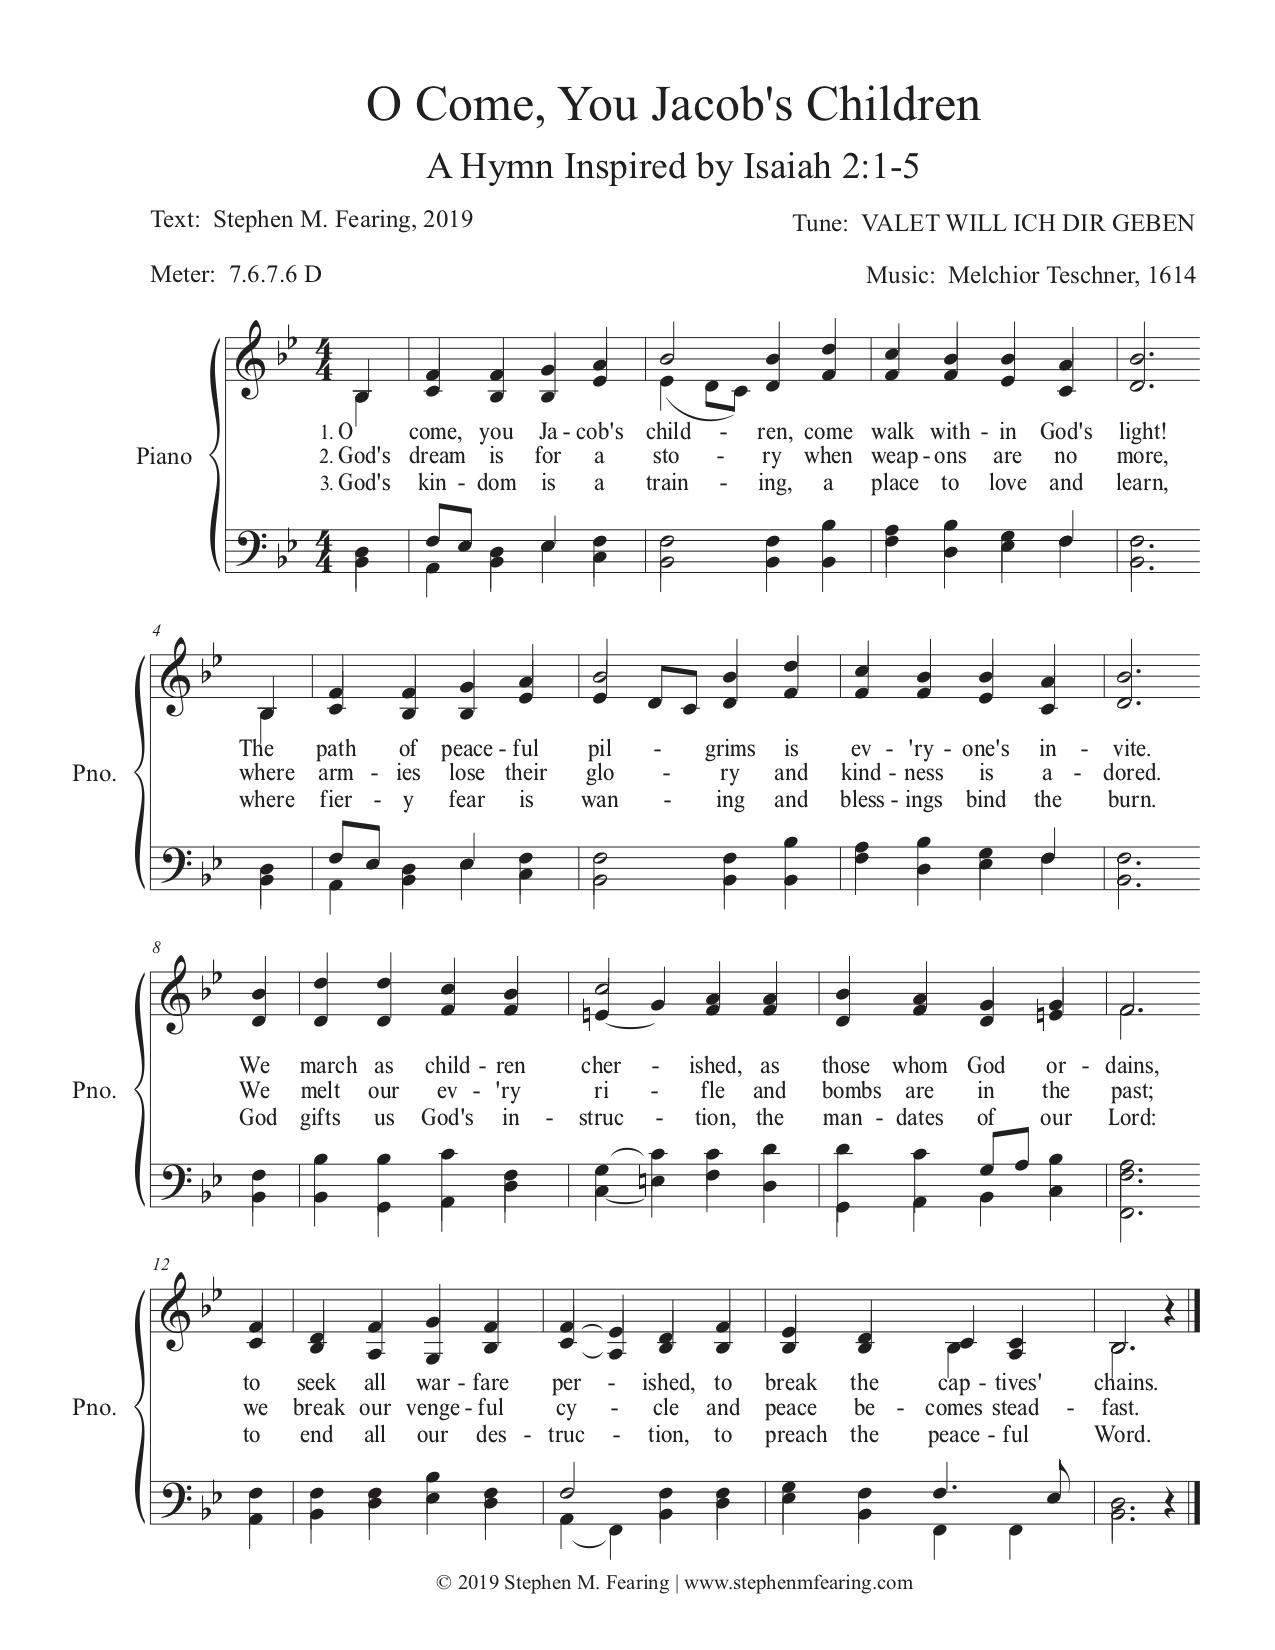 O Come, You Jacob's Children - Score.jpg